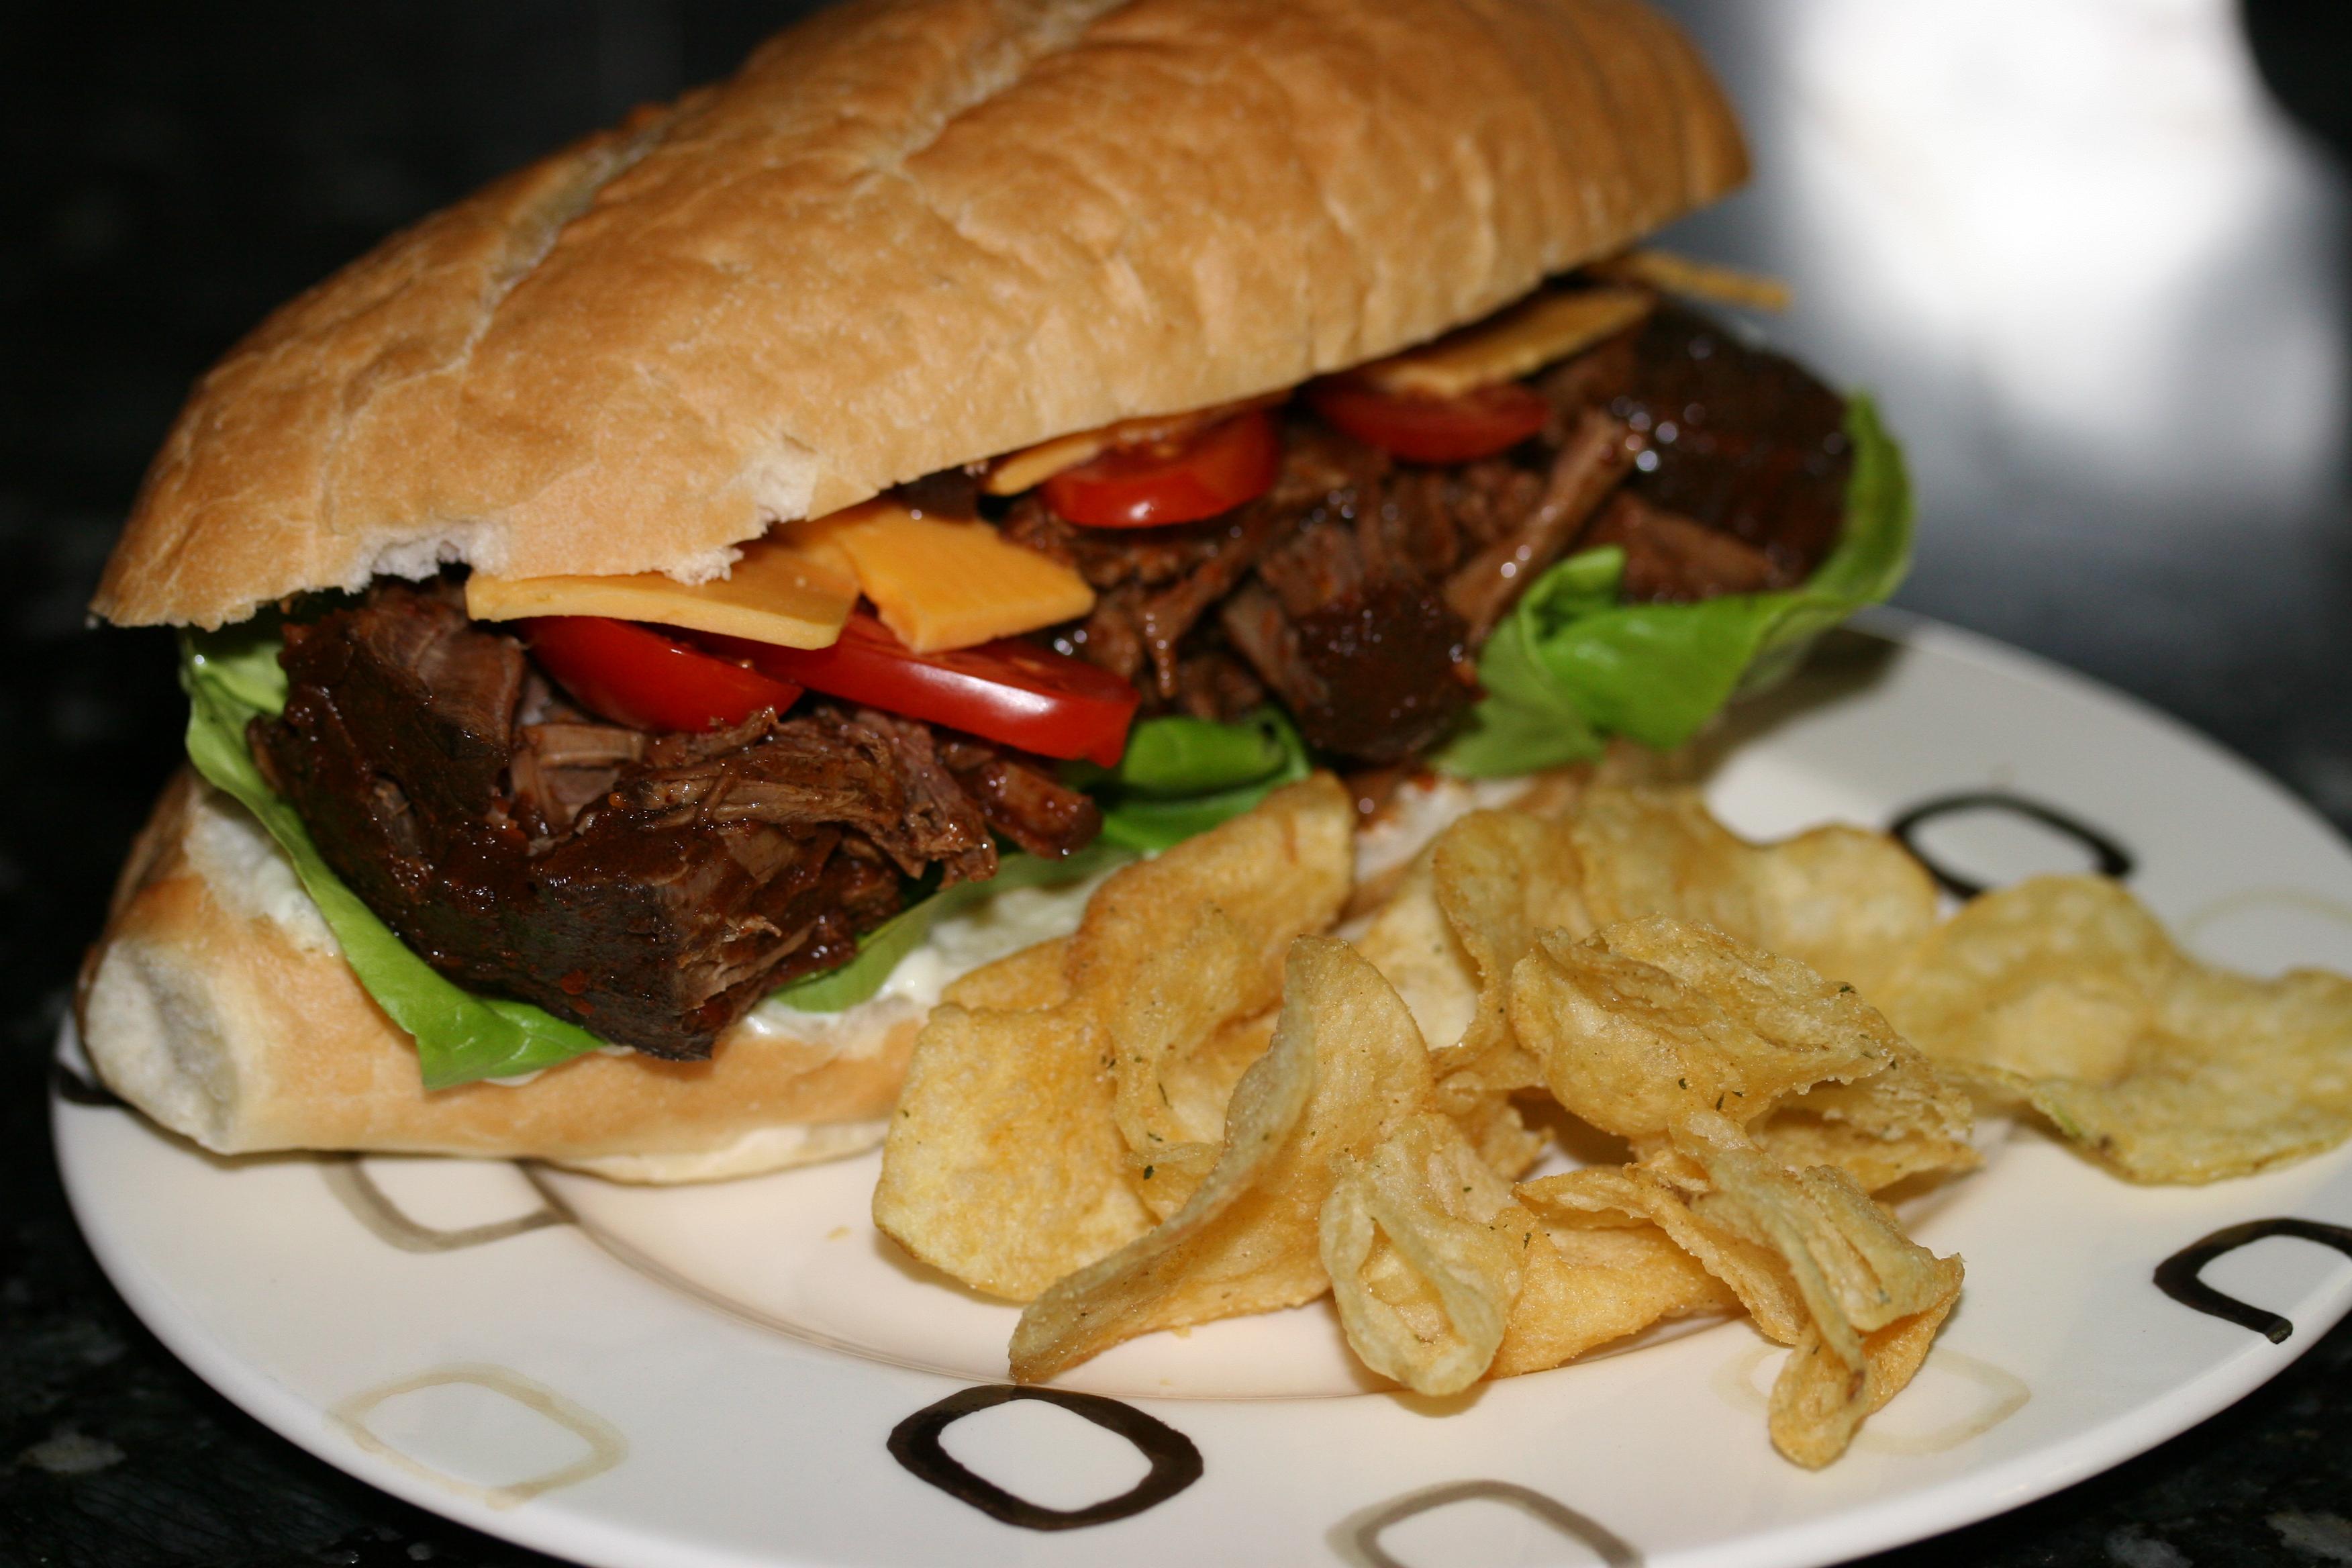 Chili Roast Beef Sandwich